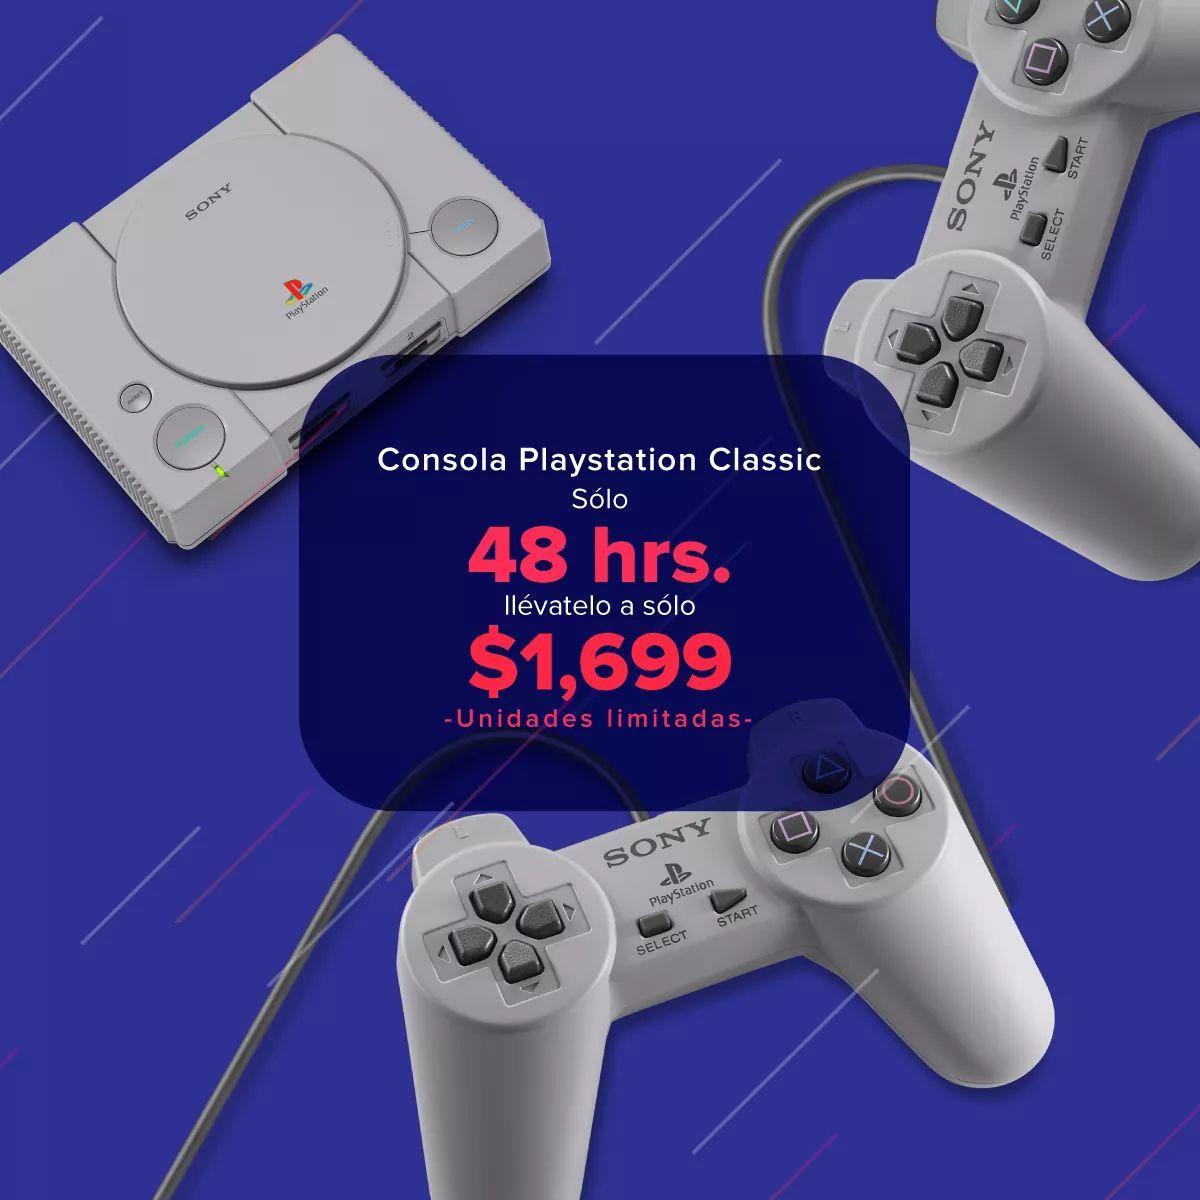 Doto: CONSOLA PLAYSTATION CLASSIC